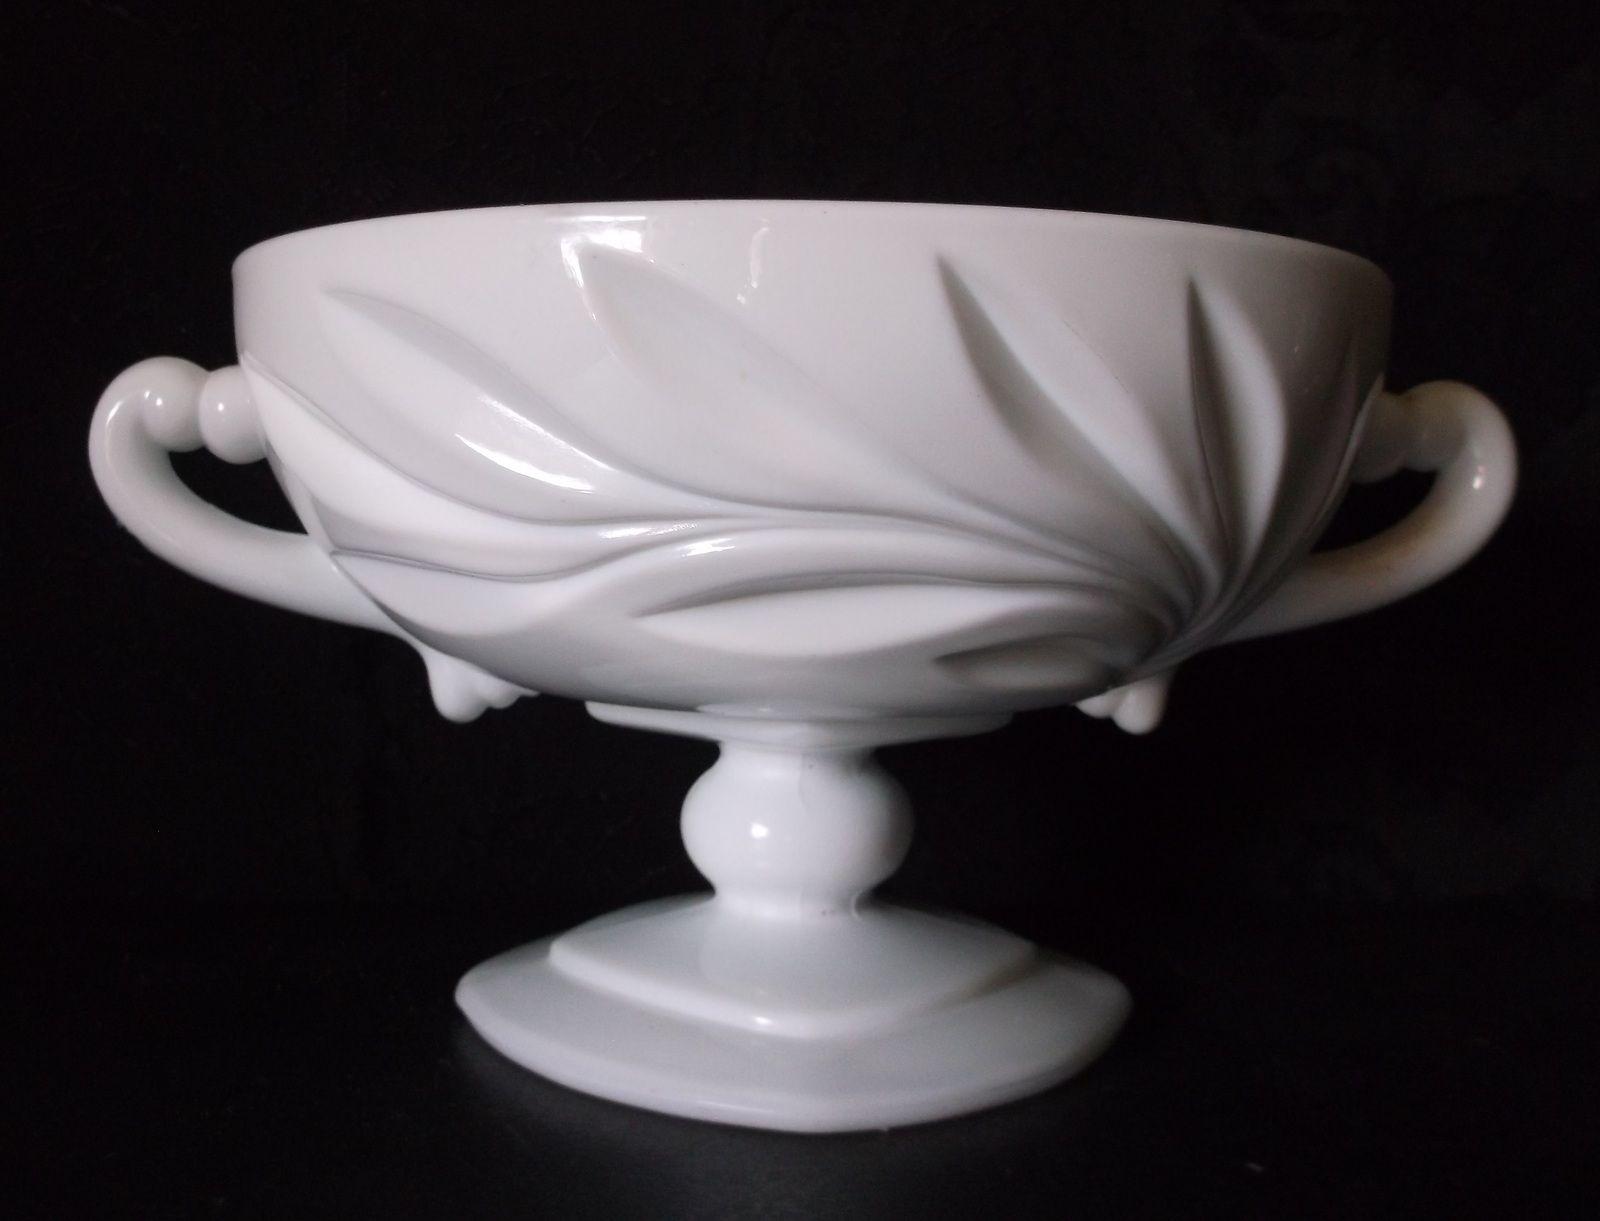 Vintage Indiana WILLOW Dish White Milk Glass @iloveoldstuff #homedecor #vintage